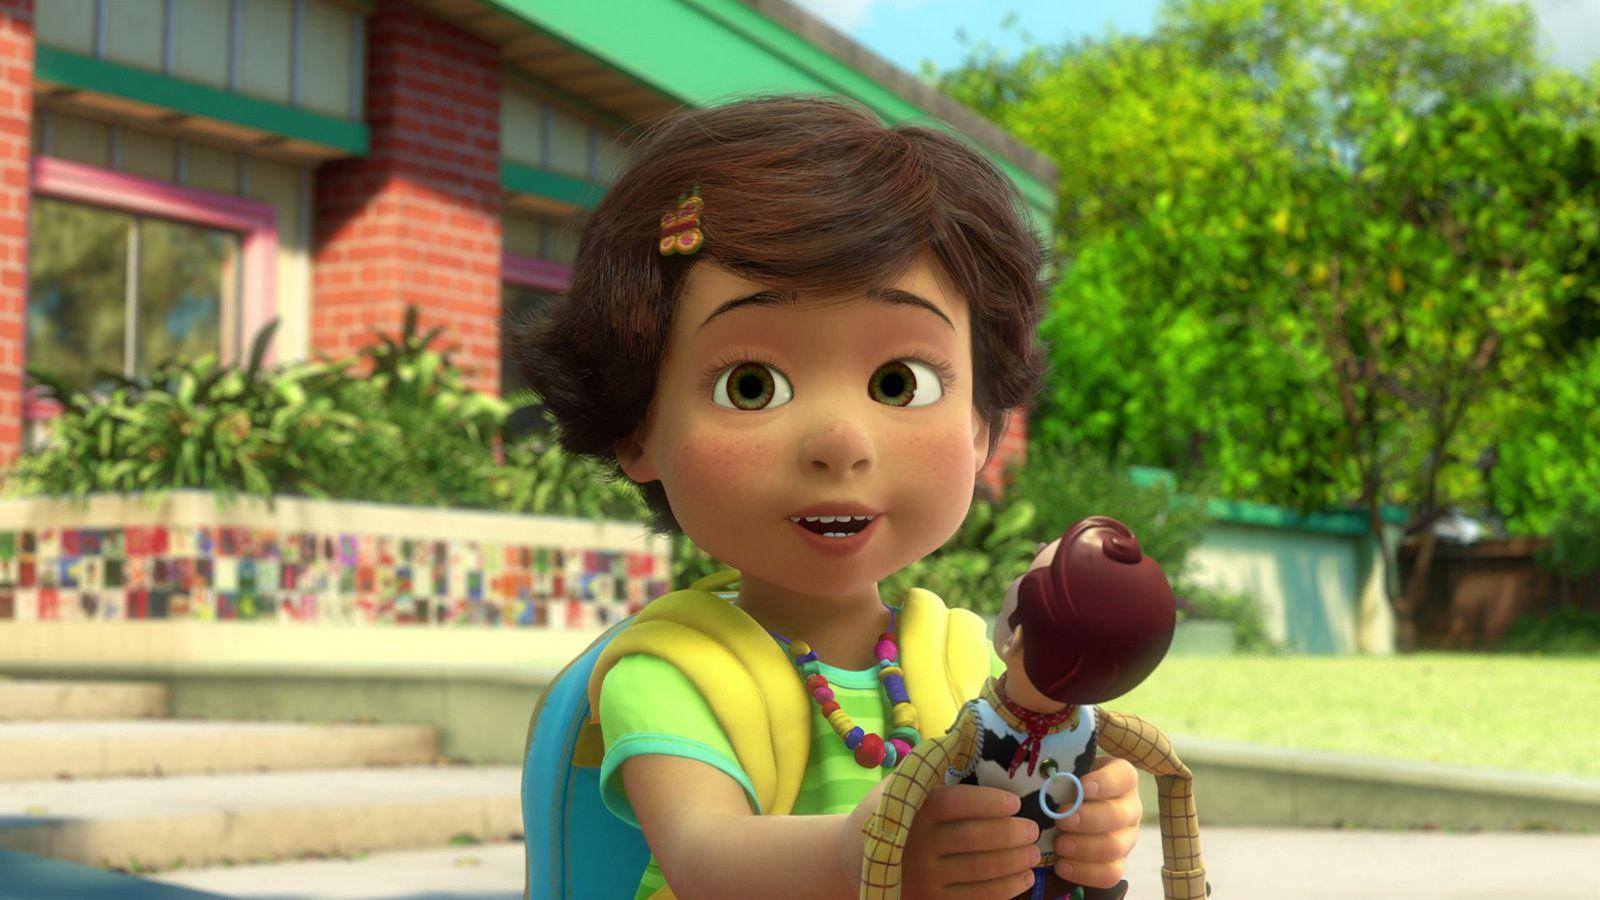 Toy story 3 (2010) Lee Unkrich